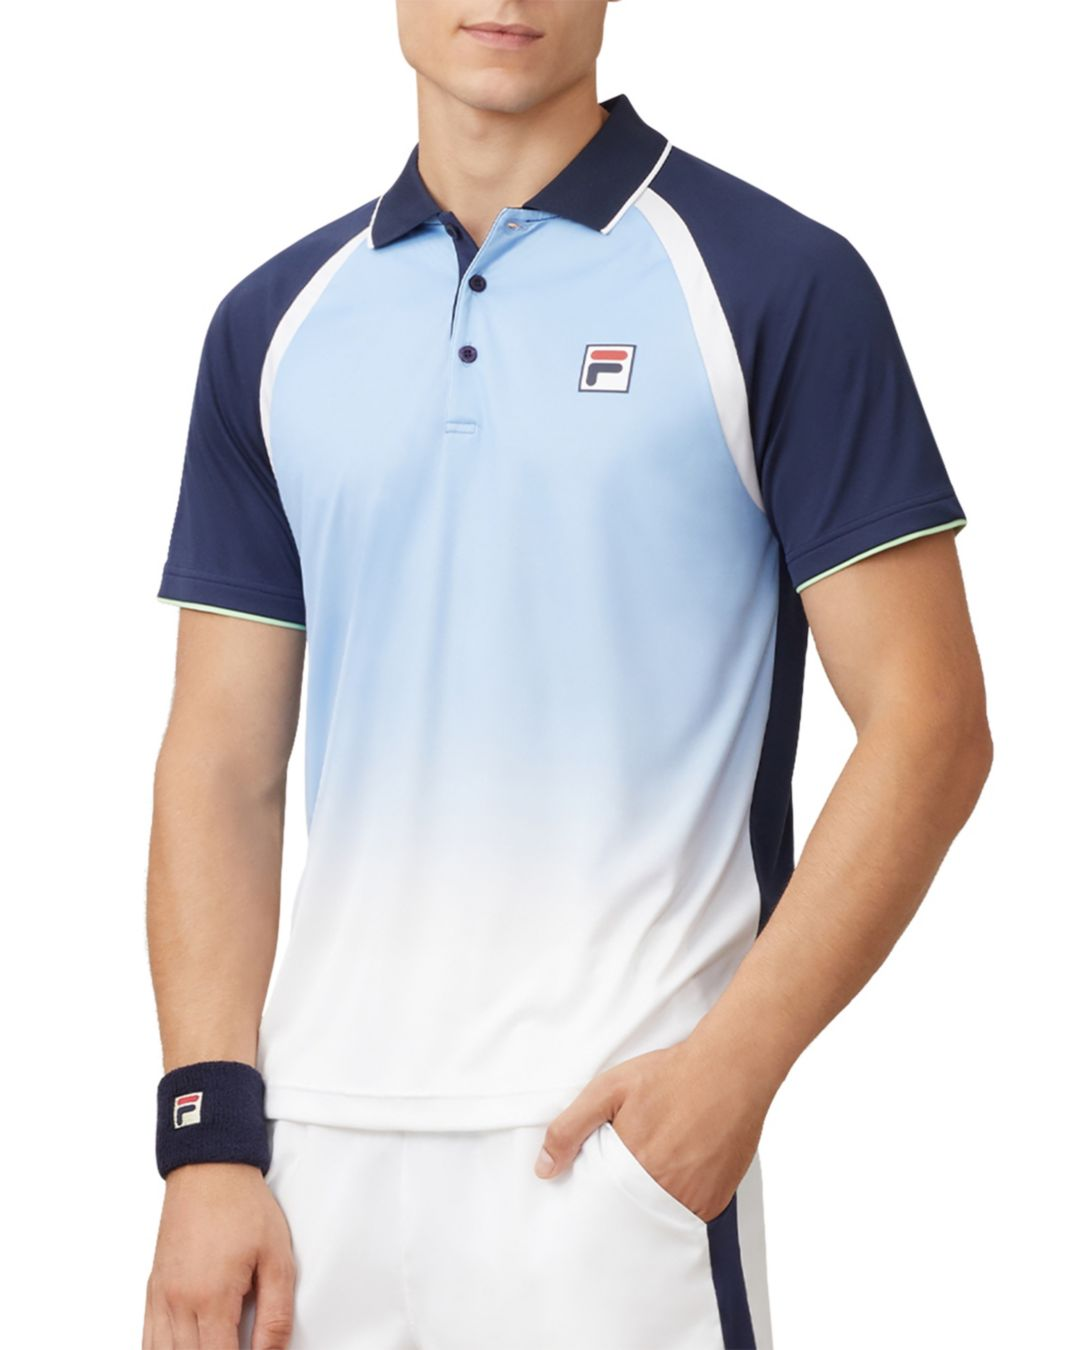 Fila Men's Legend Ombre Tennis Polo | DICK'S Sporting Goods